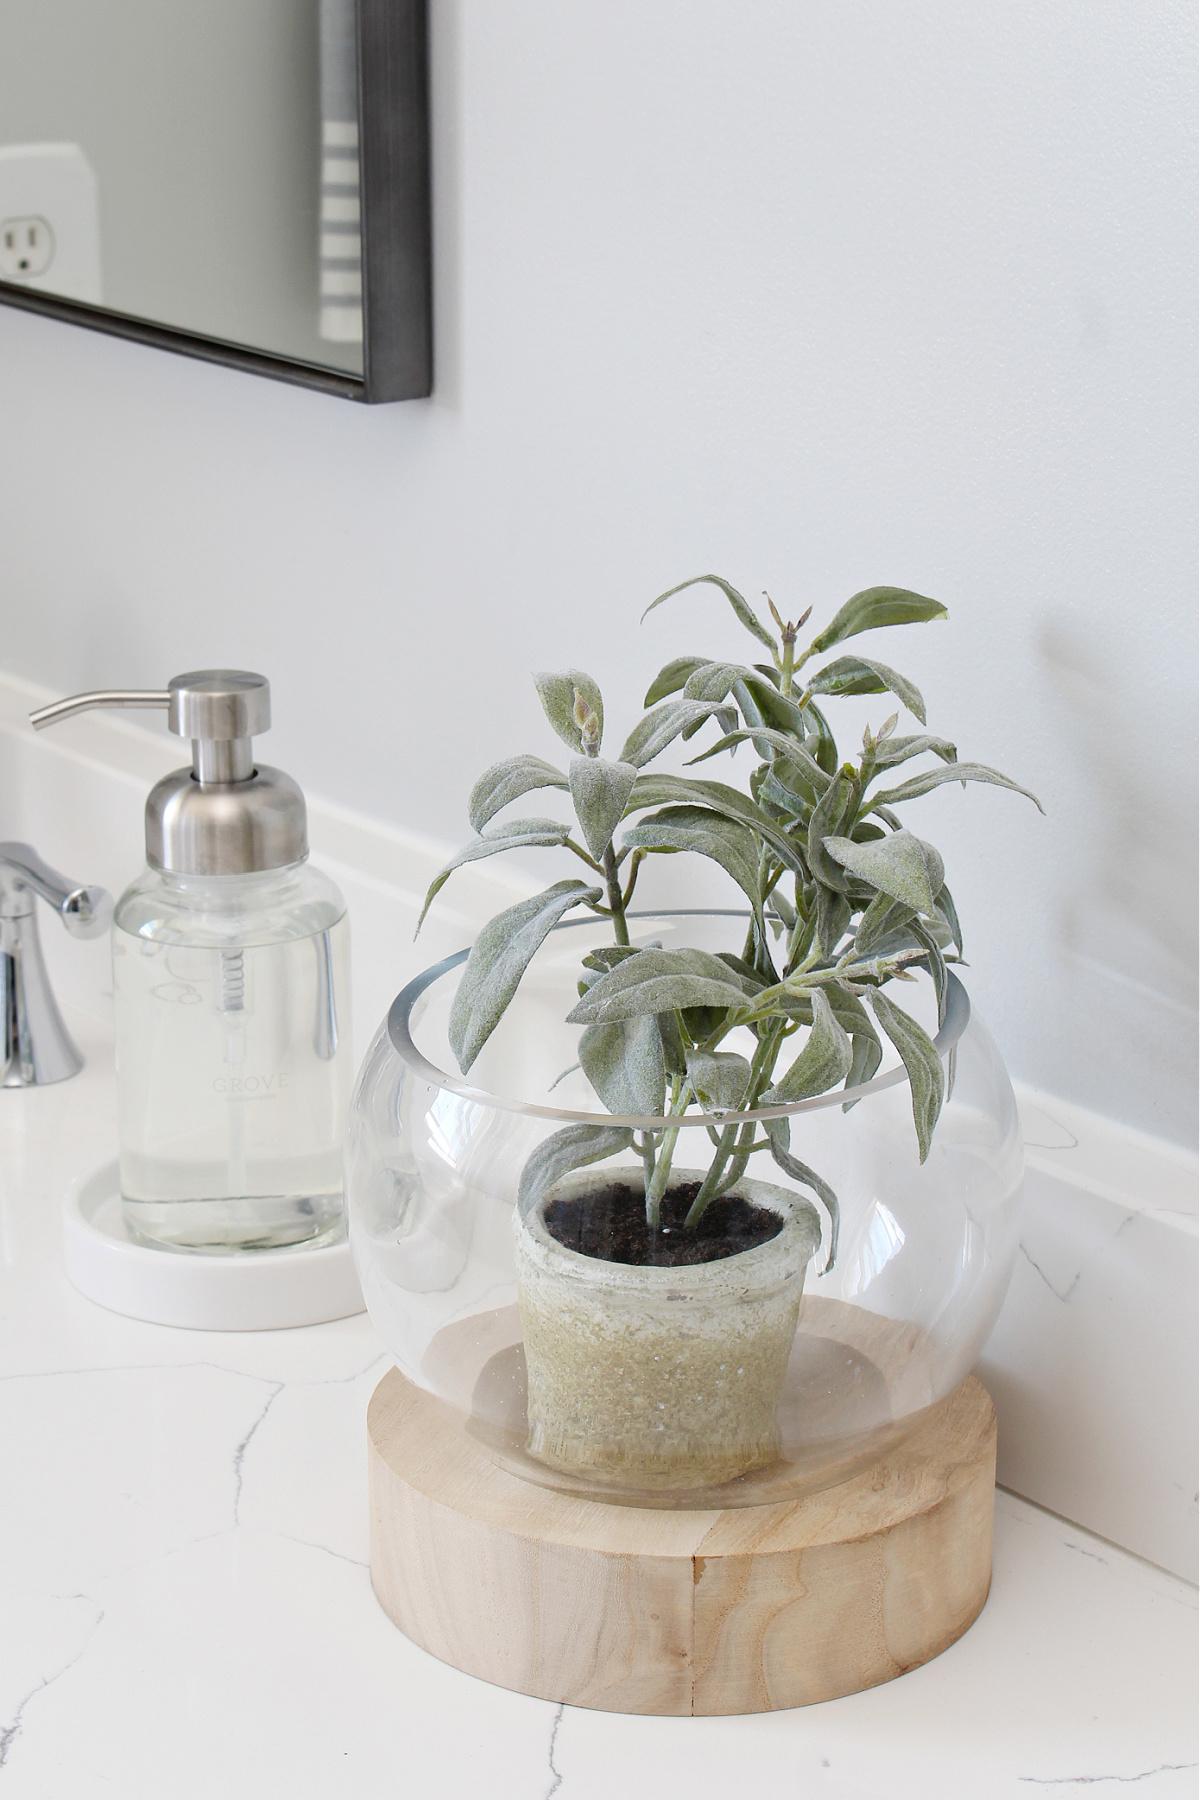 White quartz bathroom countertop with hand soap dispenser and glass plant holder.